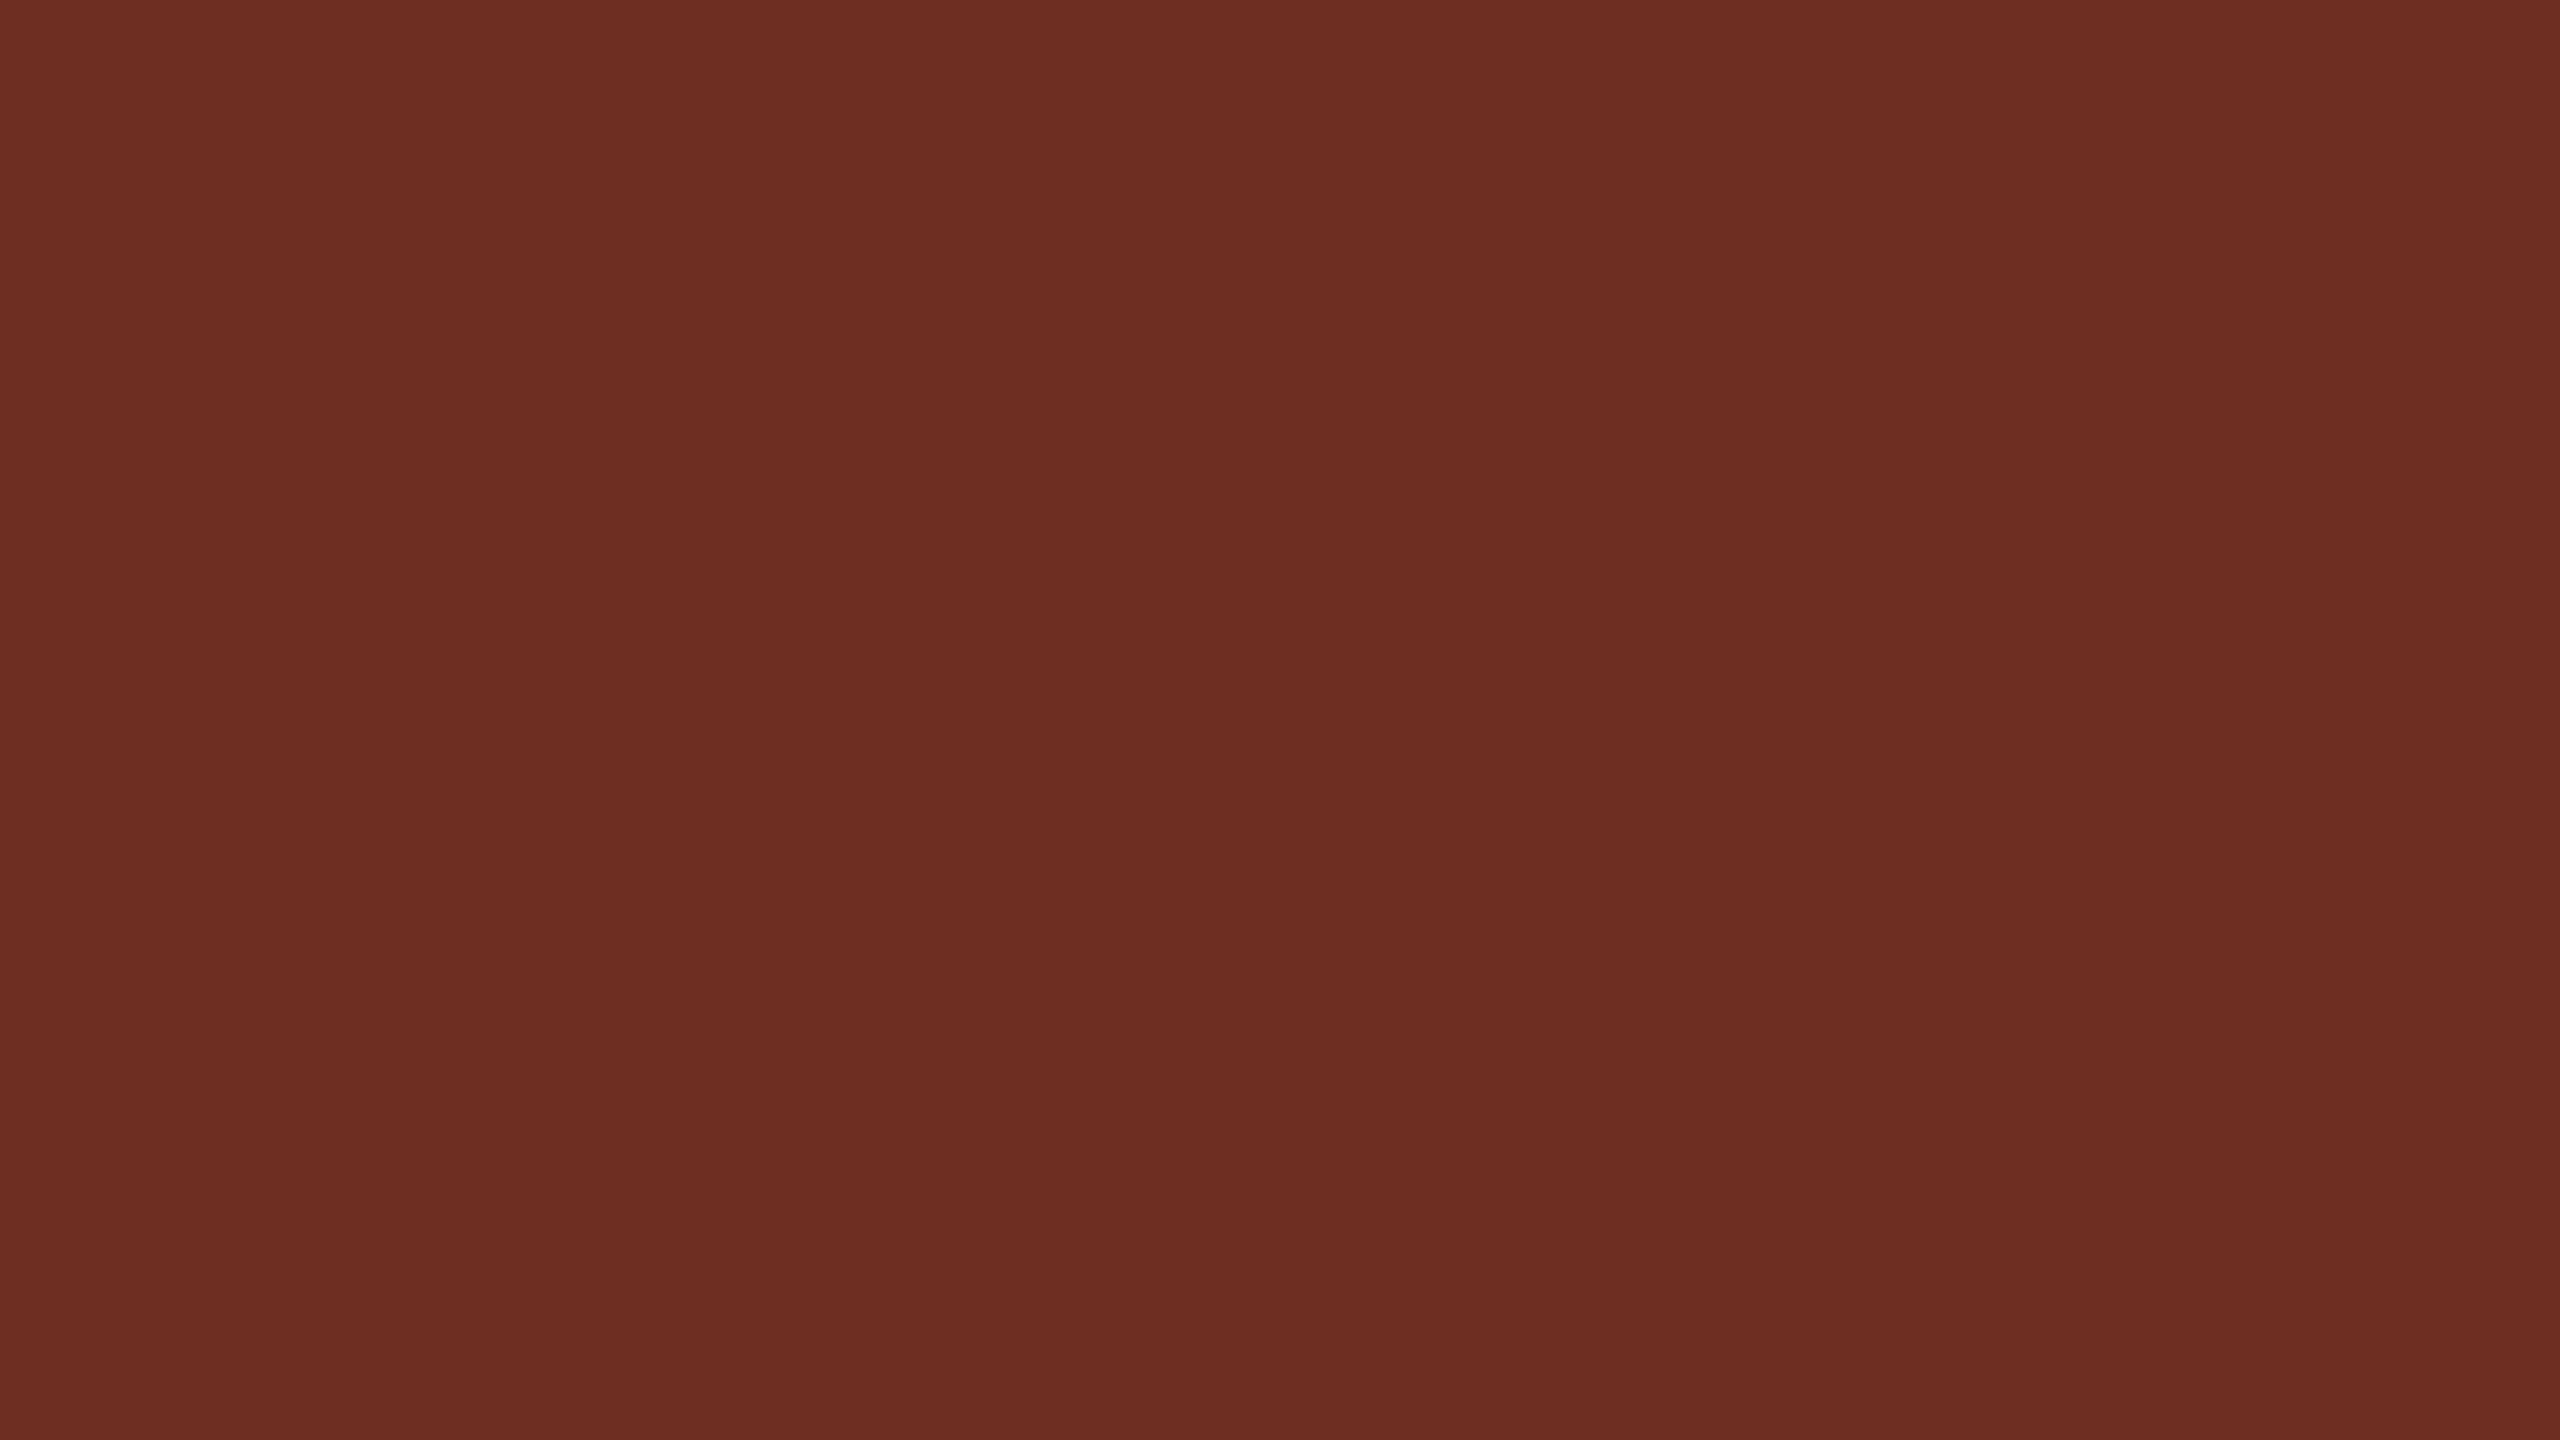 2560x1440 Liver Organ Solid Color Background